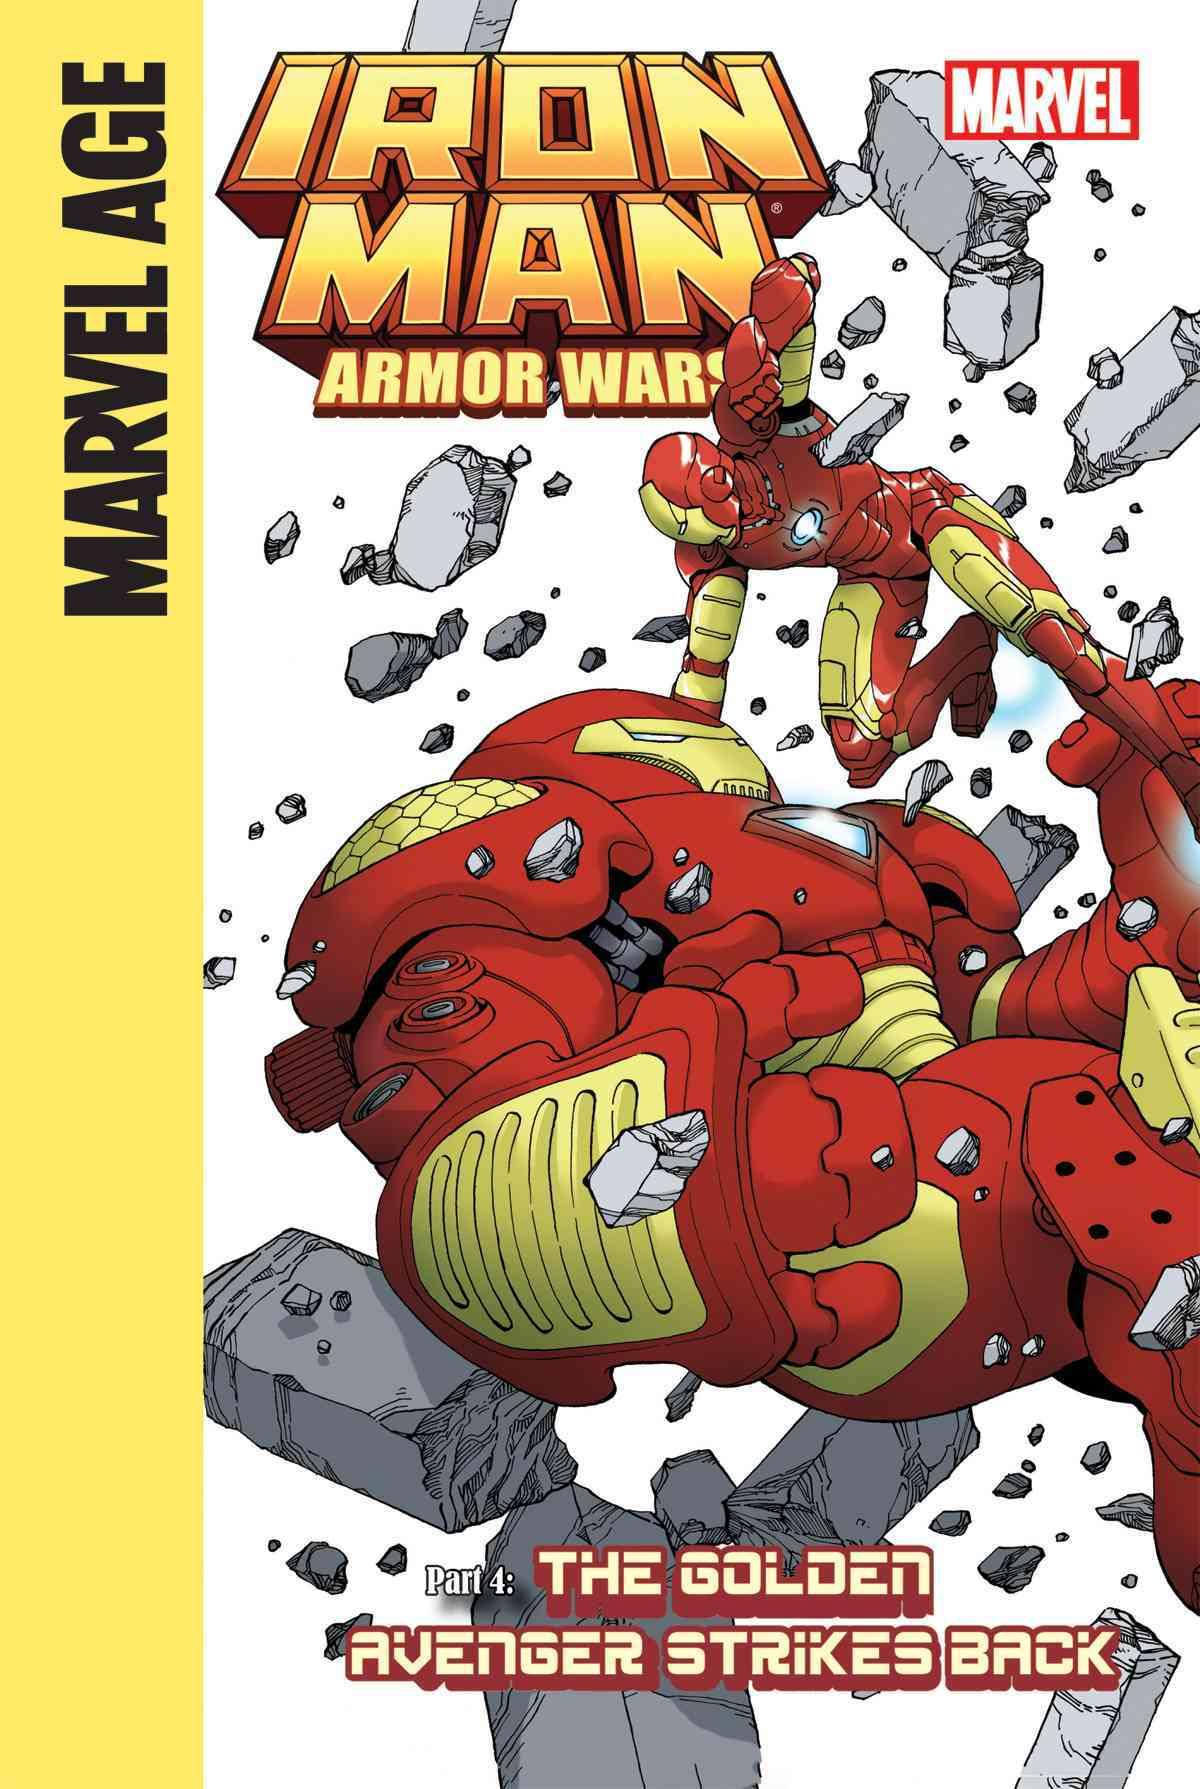 Iron Man and the Armor Wars 4 By Caramagna, Joe